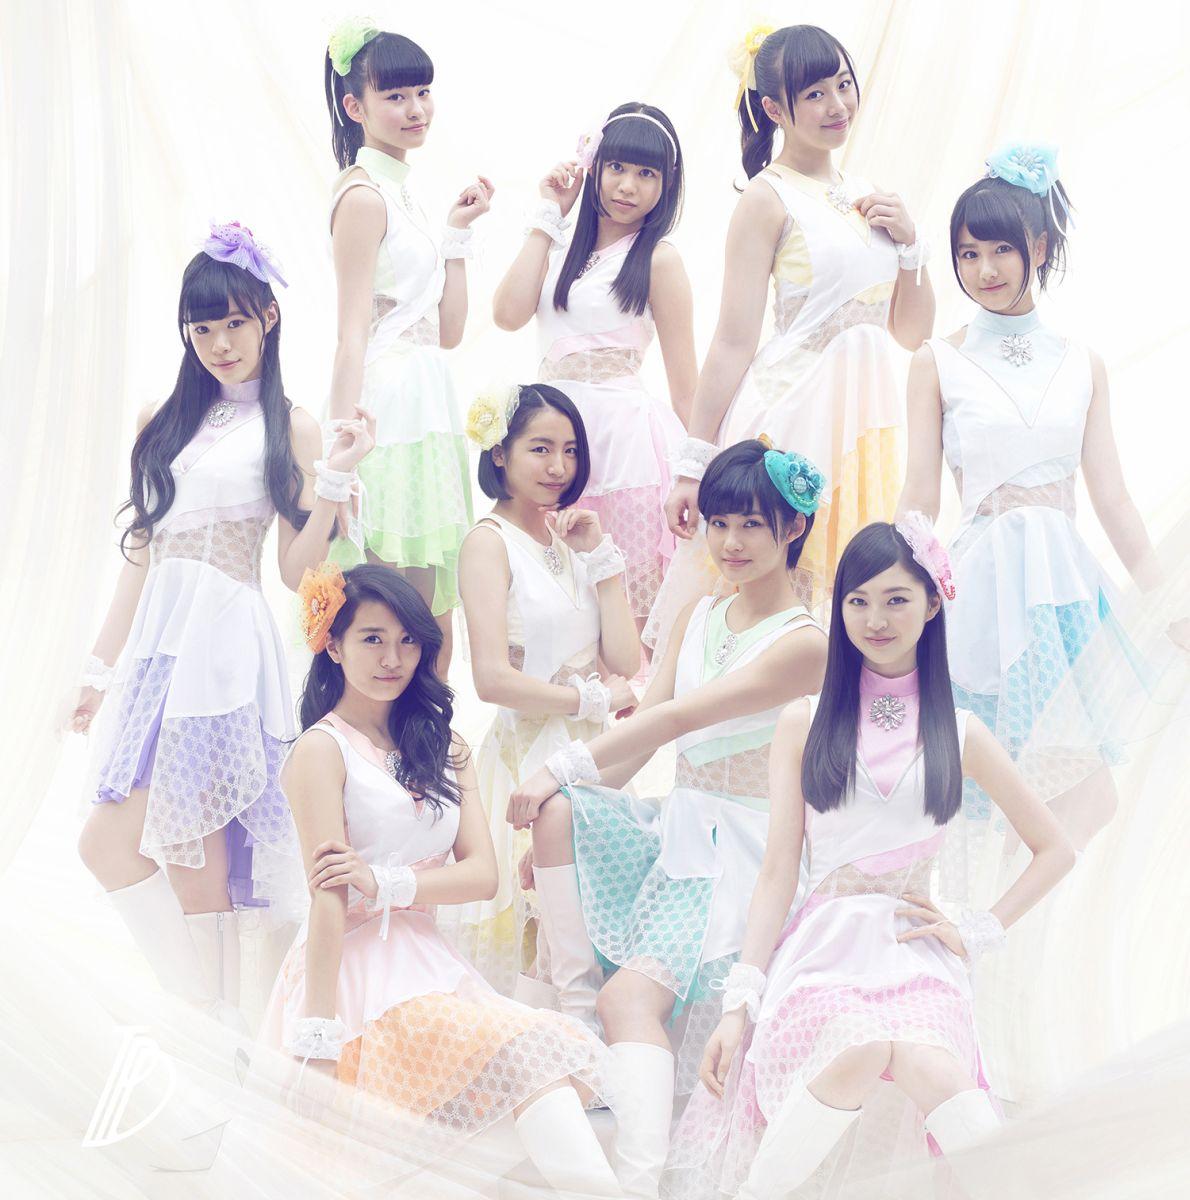 DREAMIN' (初回限定盤A CD+DVD) [ 東京パフォーマンスドール ]